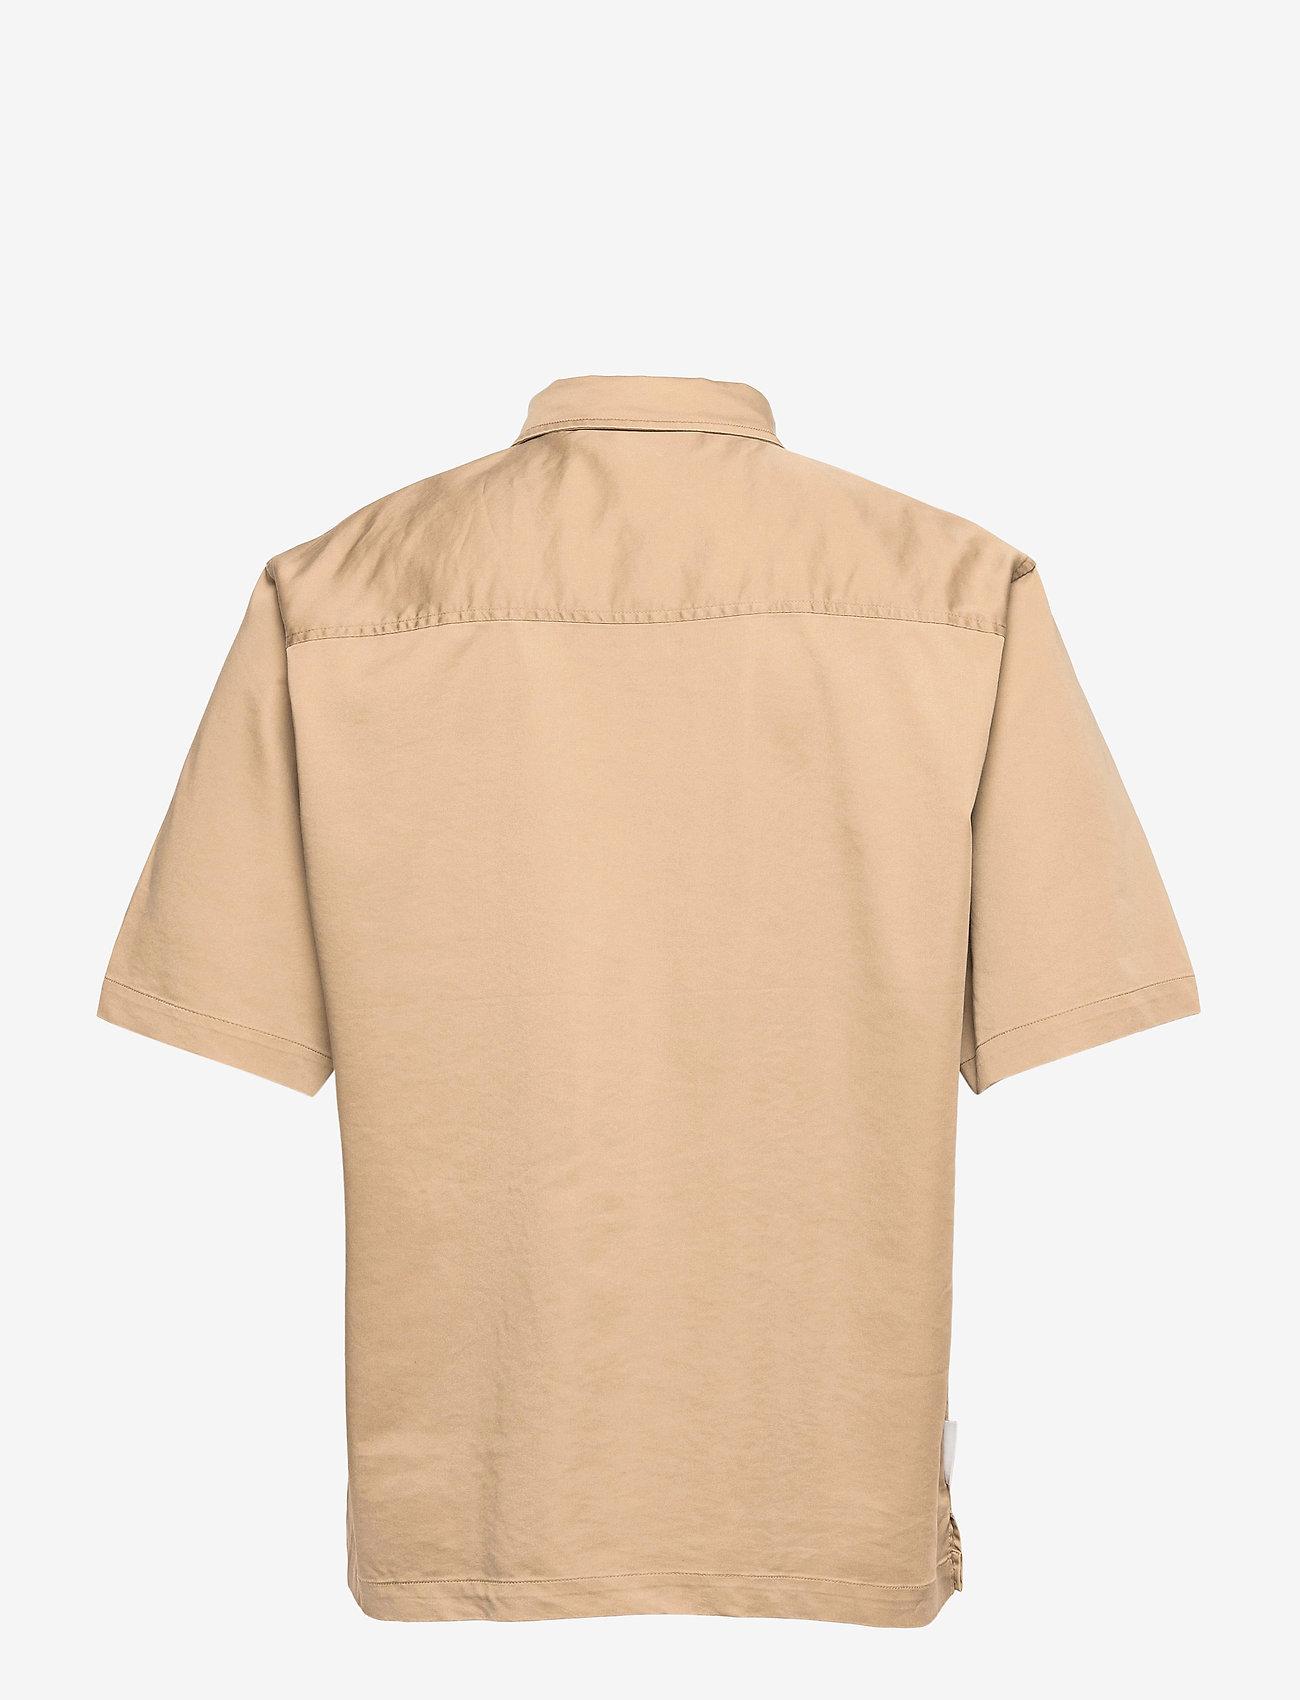 HAN Kjøbenhavn - Boxy Shirt SS - oxford overhemden - olive grey - 2